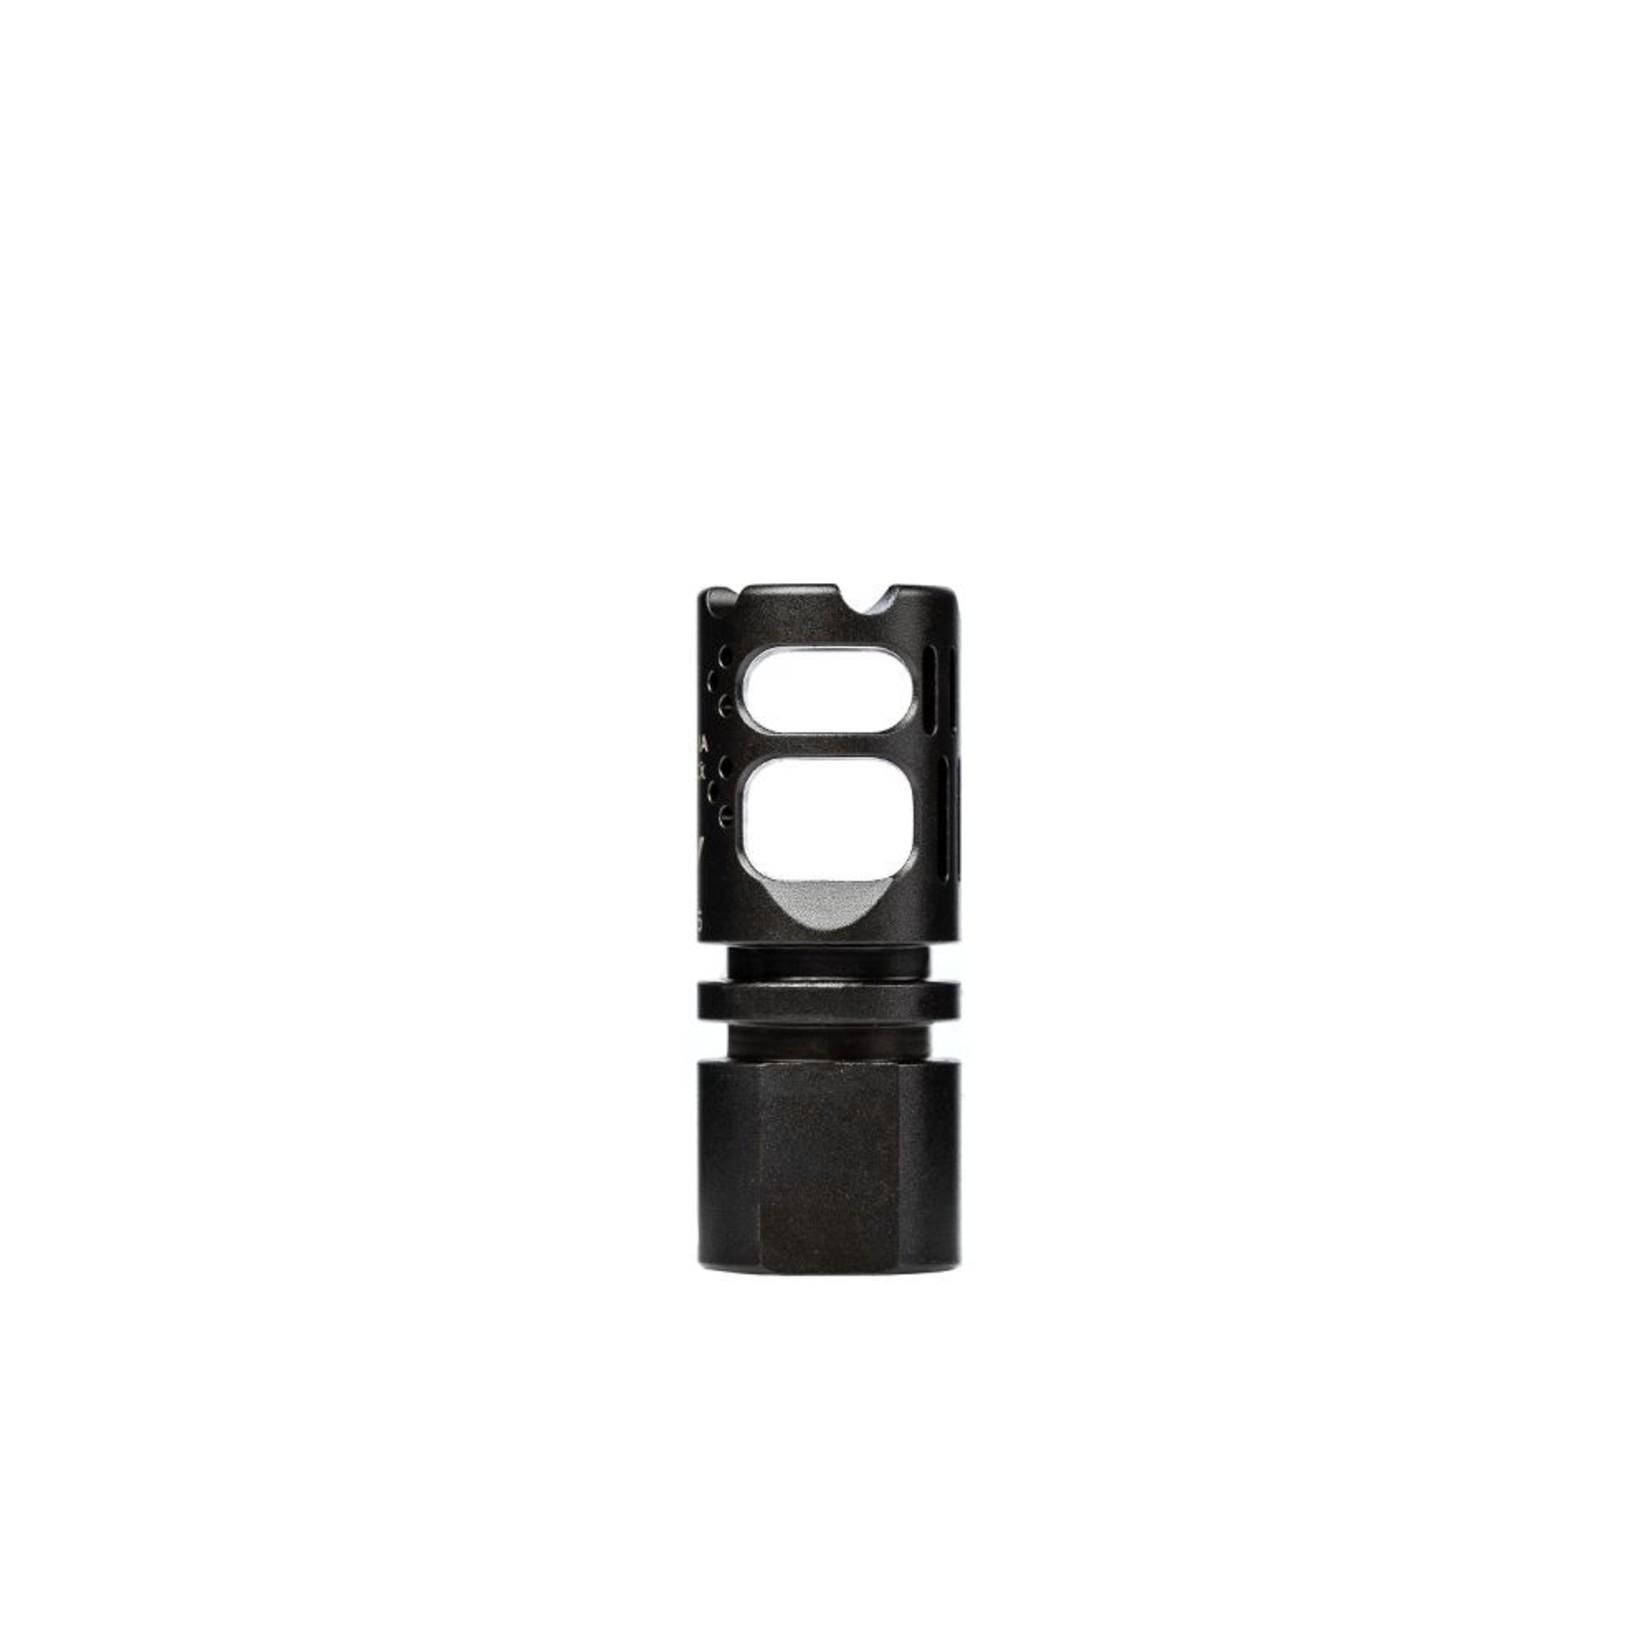 VG6 VG6 Gamma Muzzle Break, Black, Gamma 556 EX